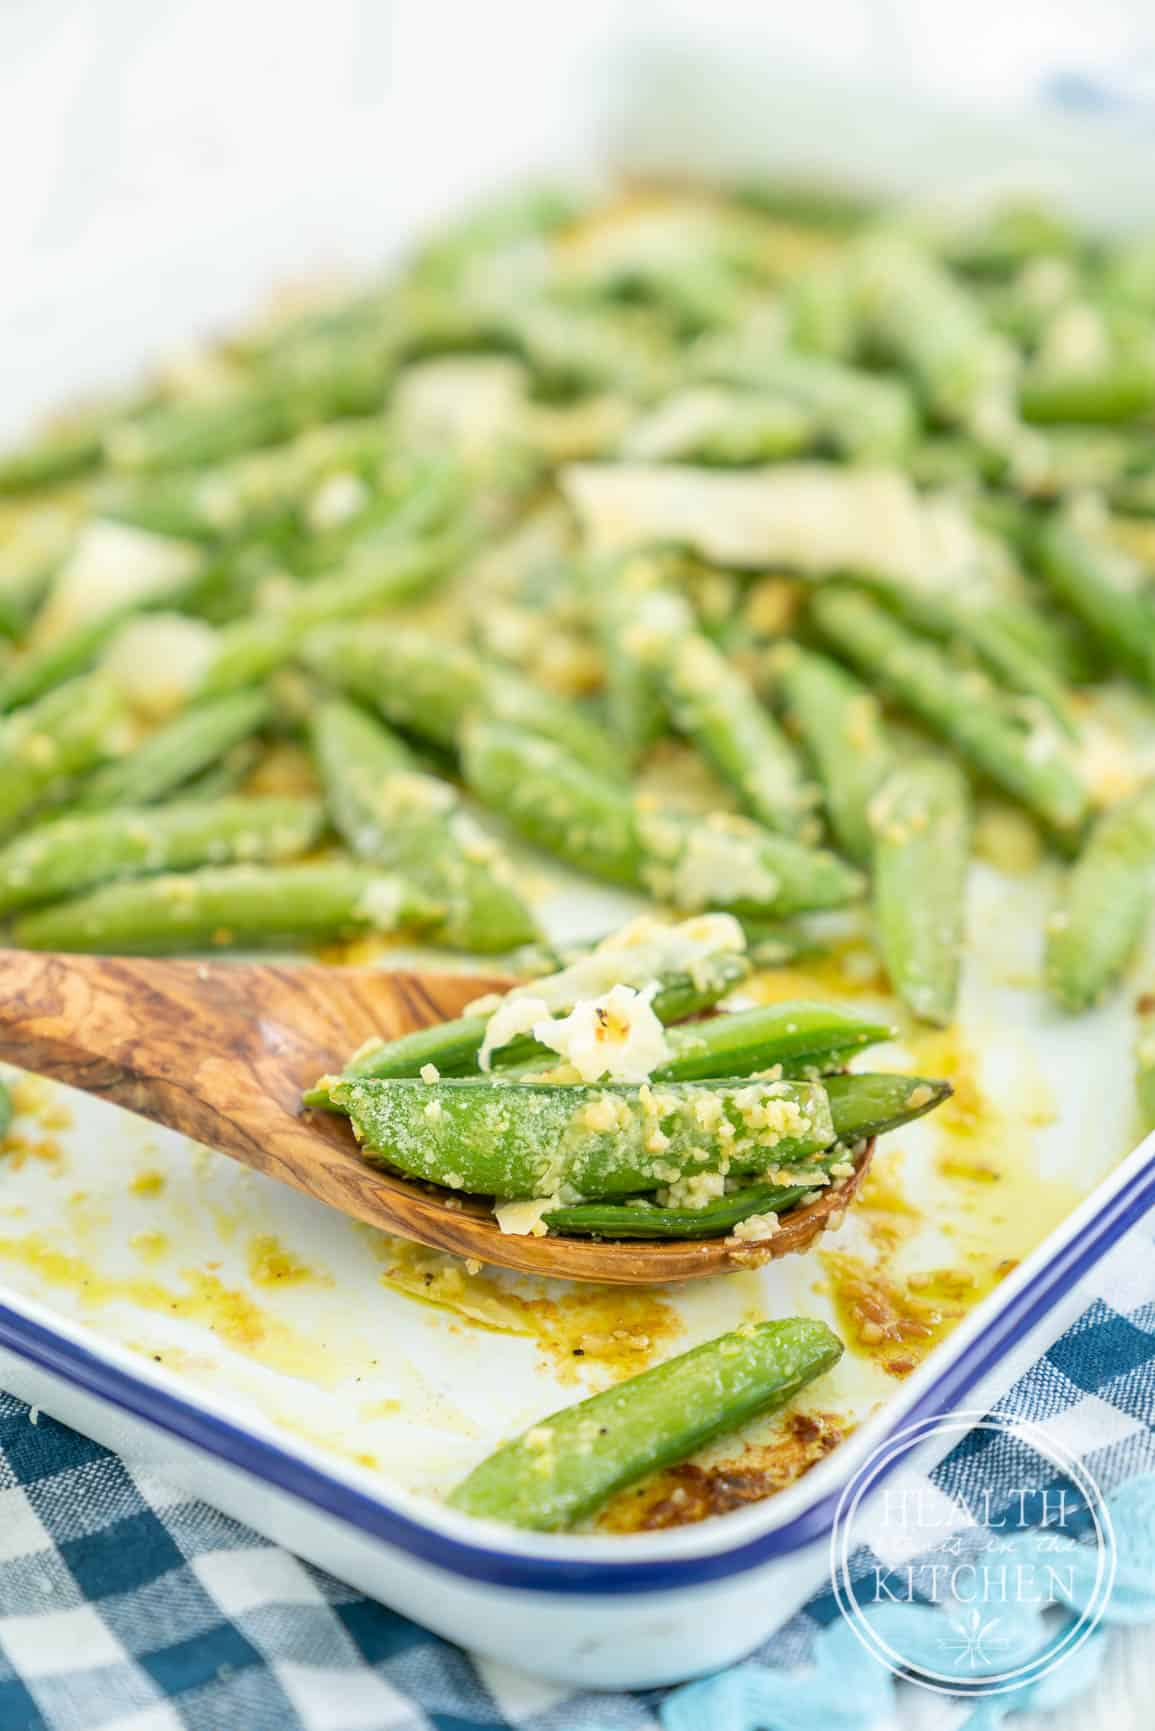 Parmesan Garlic Roasted Sugar Snap Peas - Low Carb